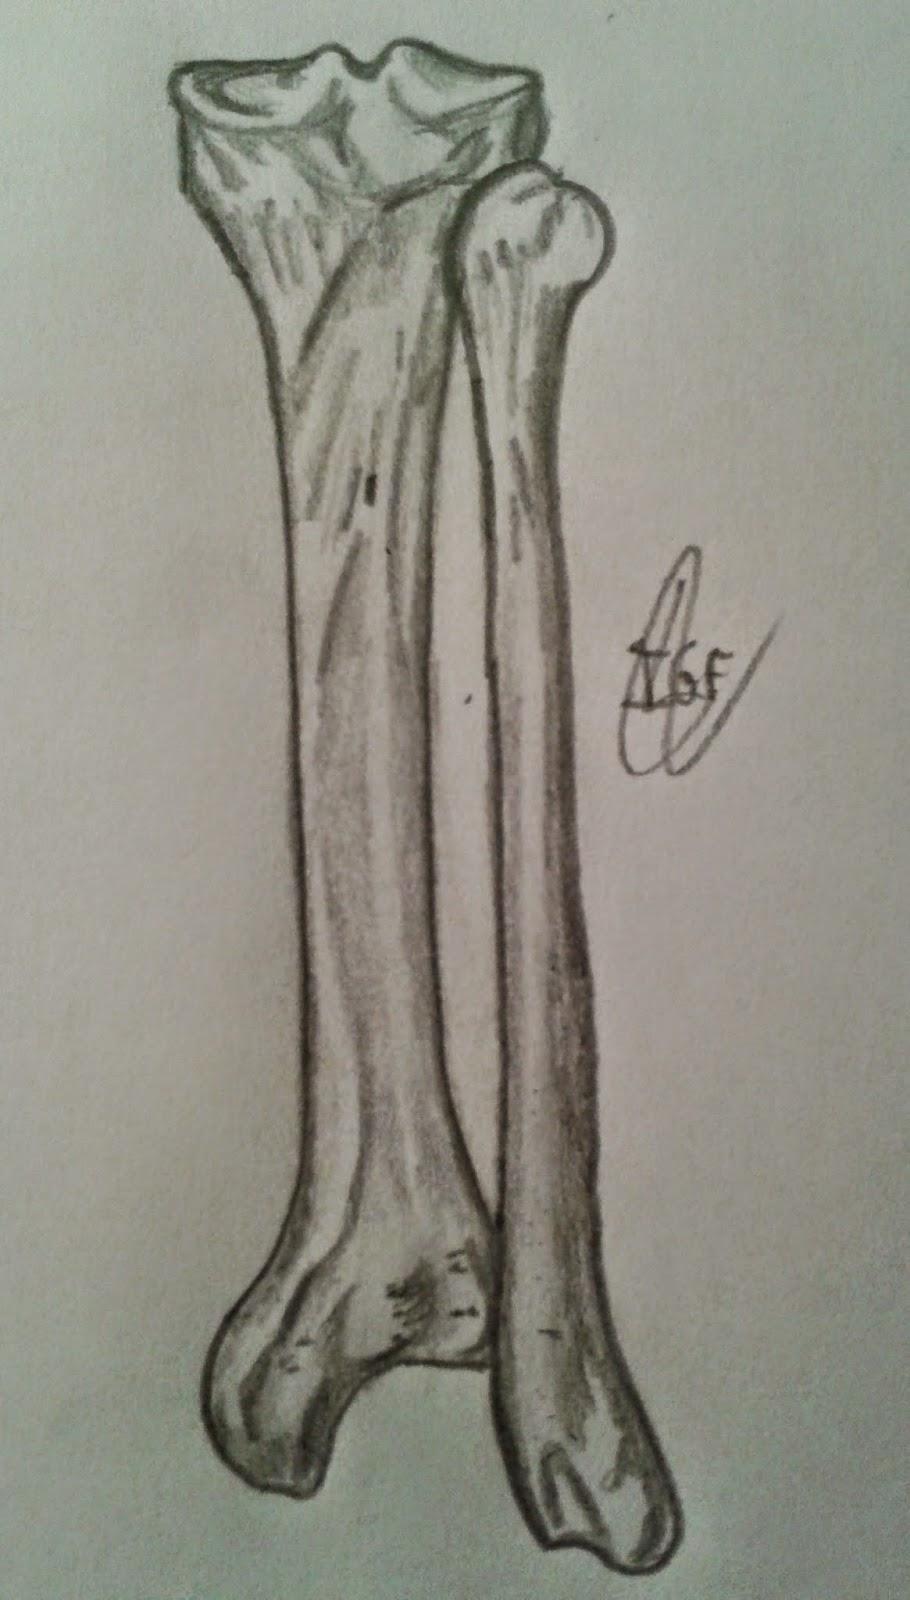 Gantxegi\'s Anatomy: Tibia y peroné: vista posterior